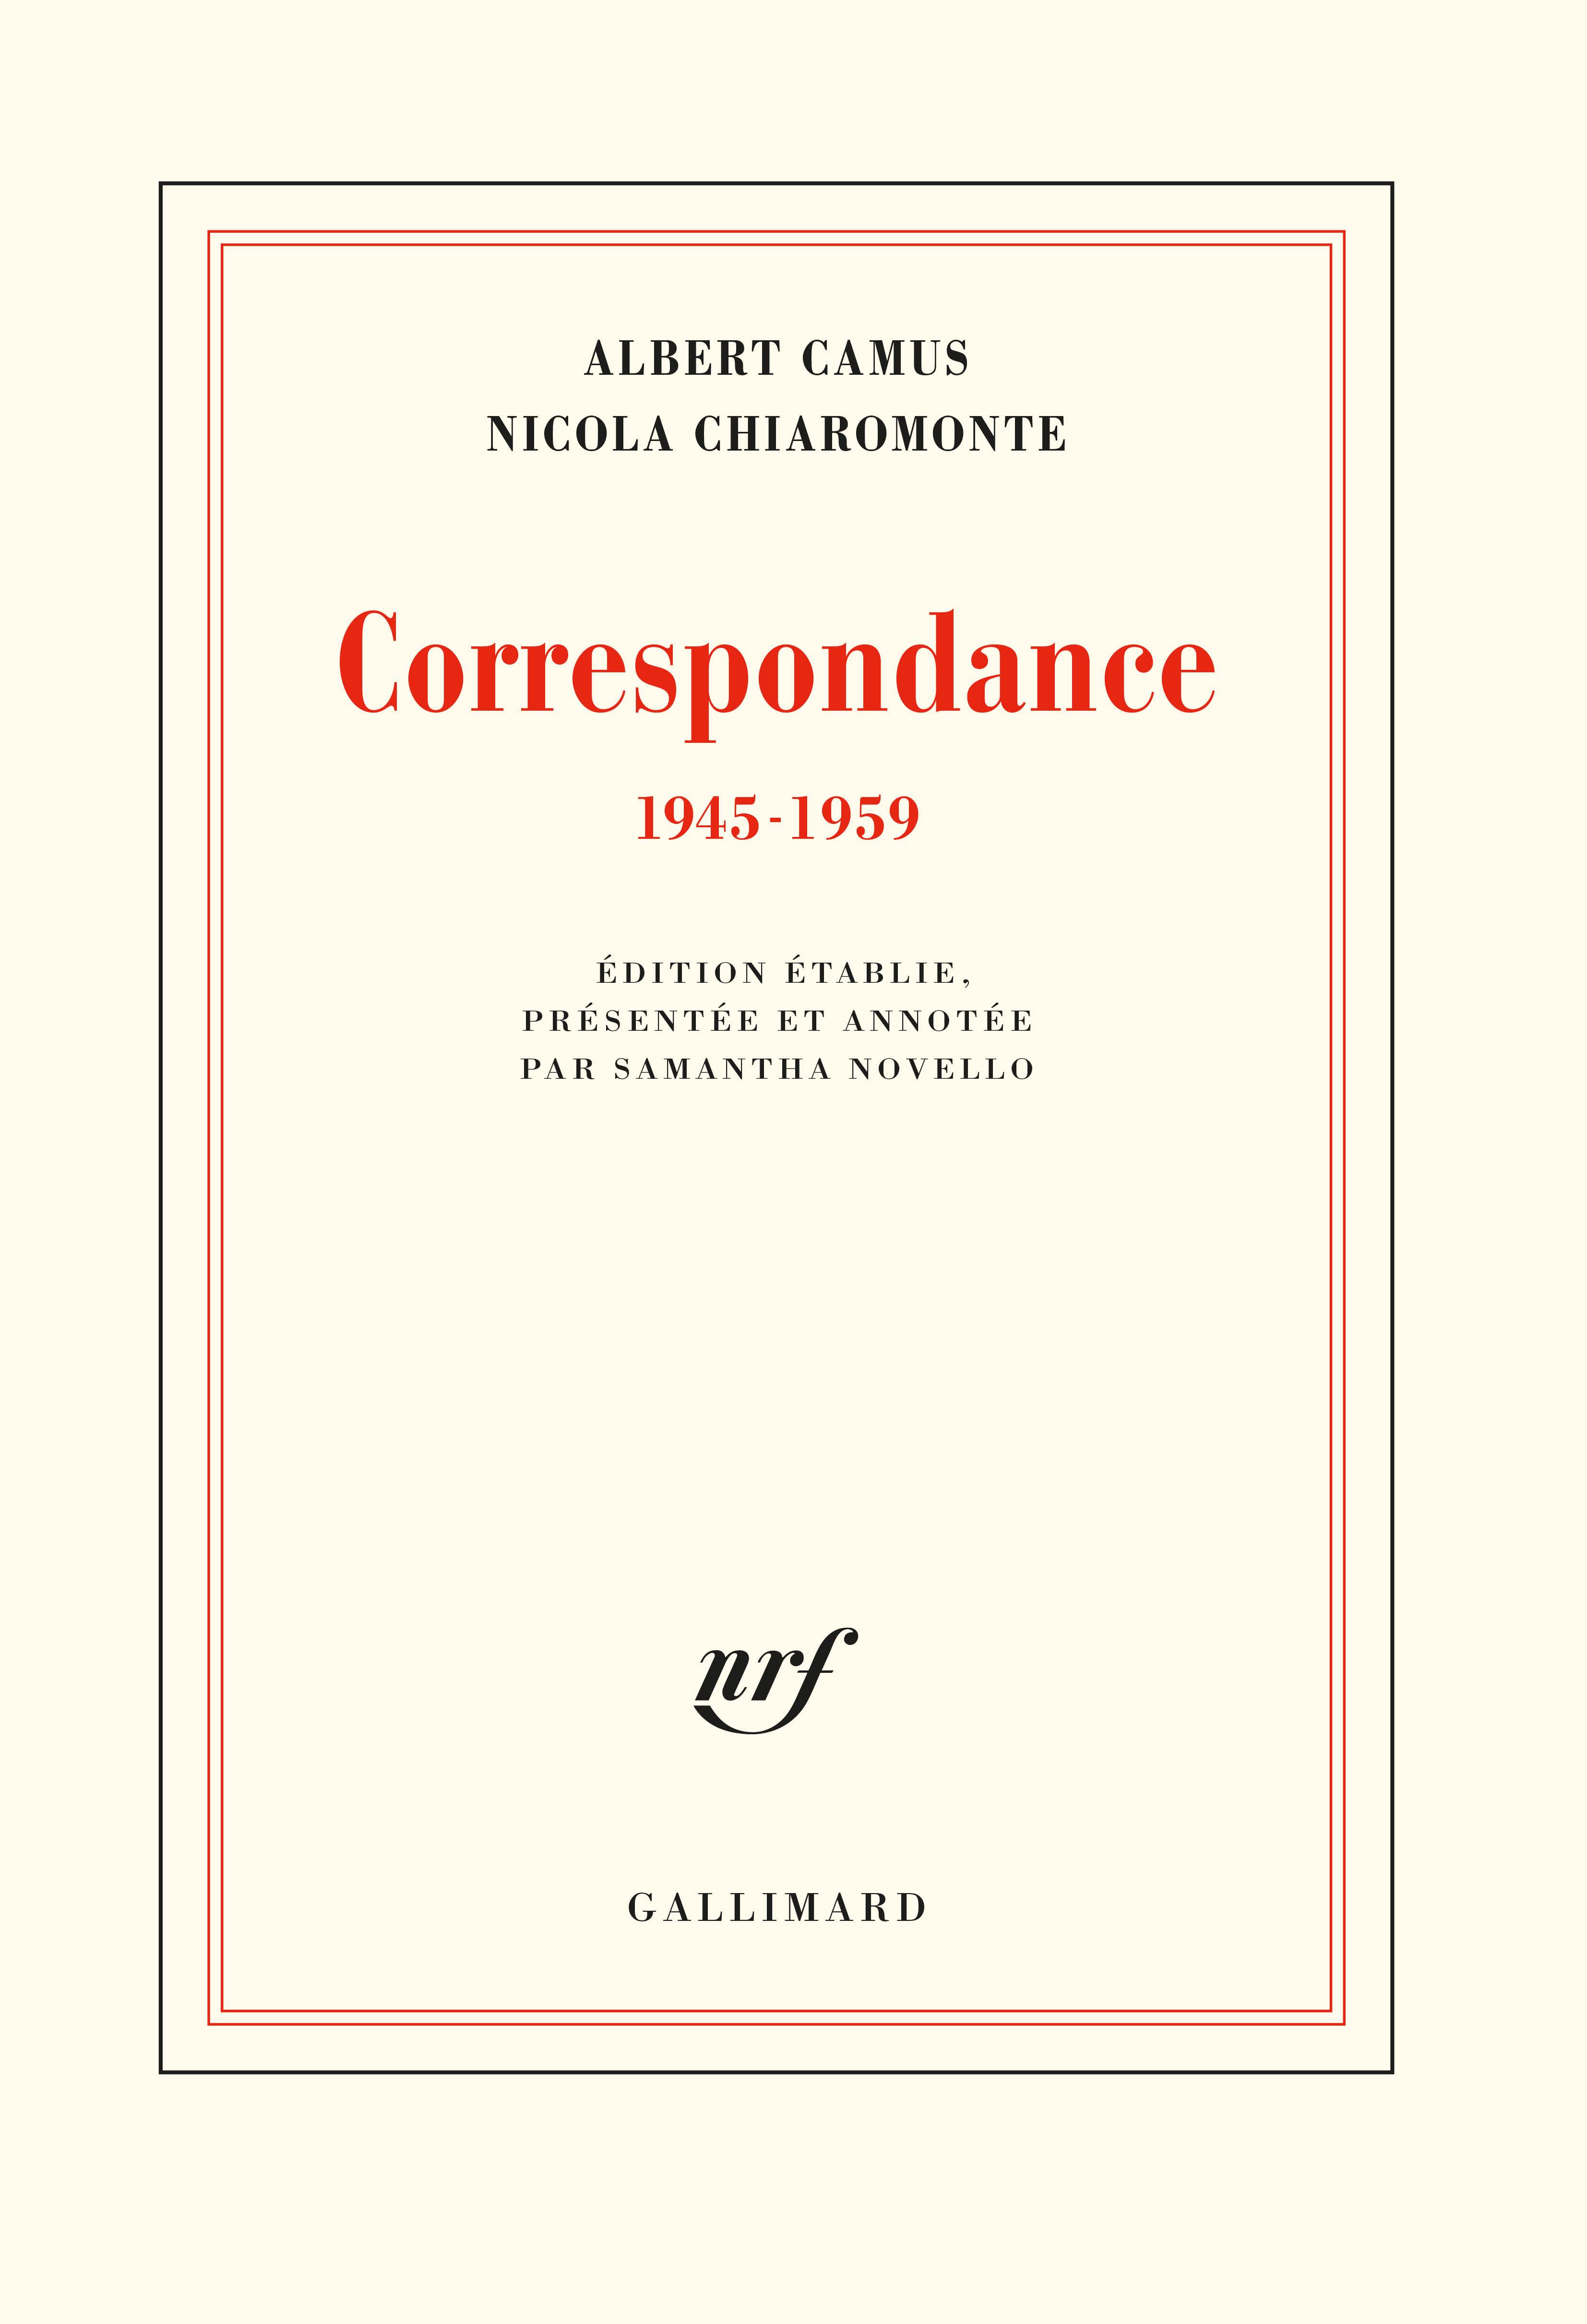 A. Camus, N. Chiaromonte, Correspondance (1945-1959)